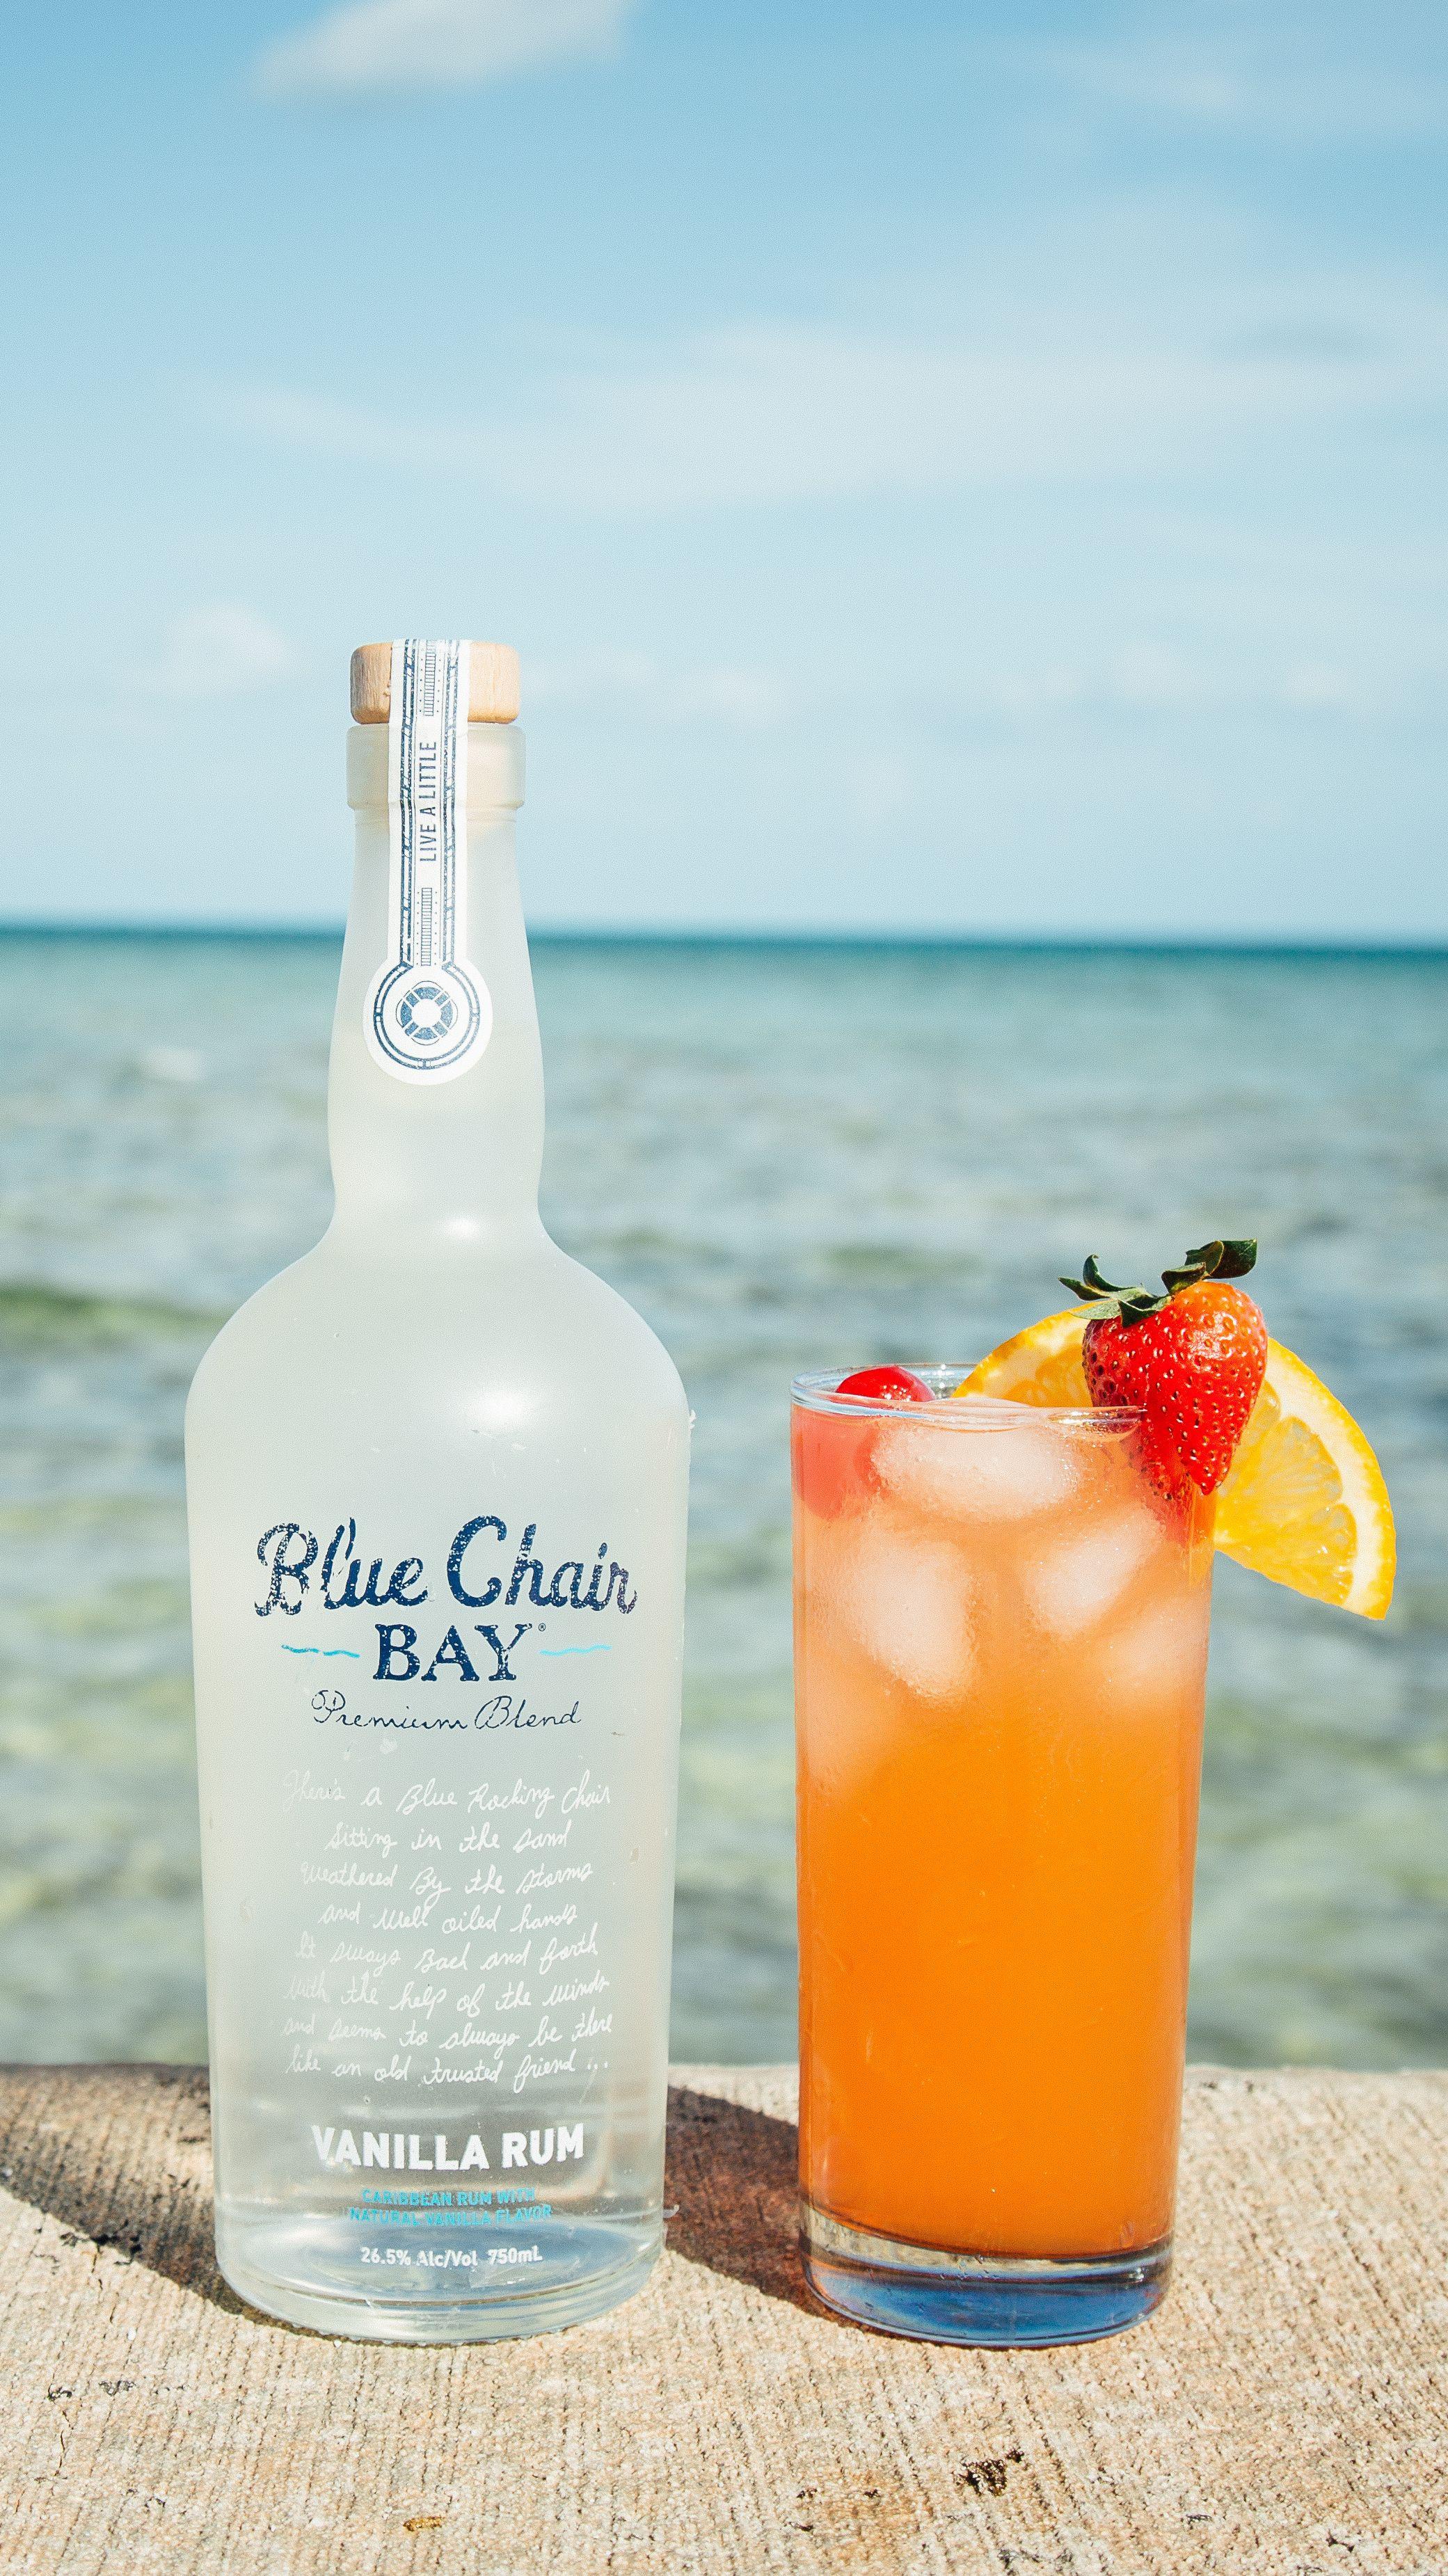 Rum Drinks With Pineapple Juice  BEACH CHAIR COCKTAIL 2 oz Blue Chair Bay Vanilla Rum